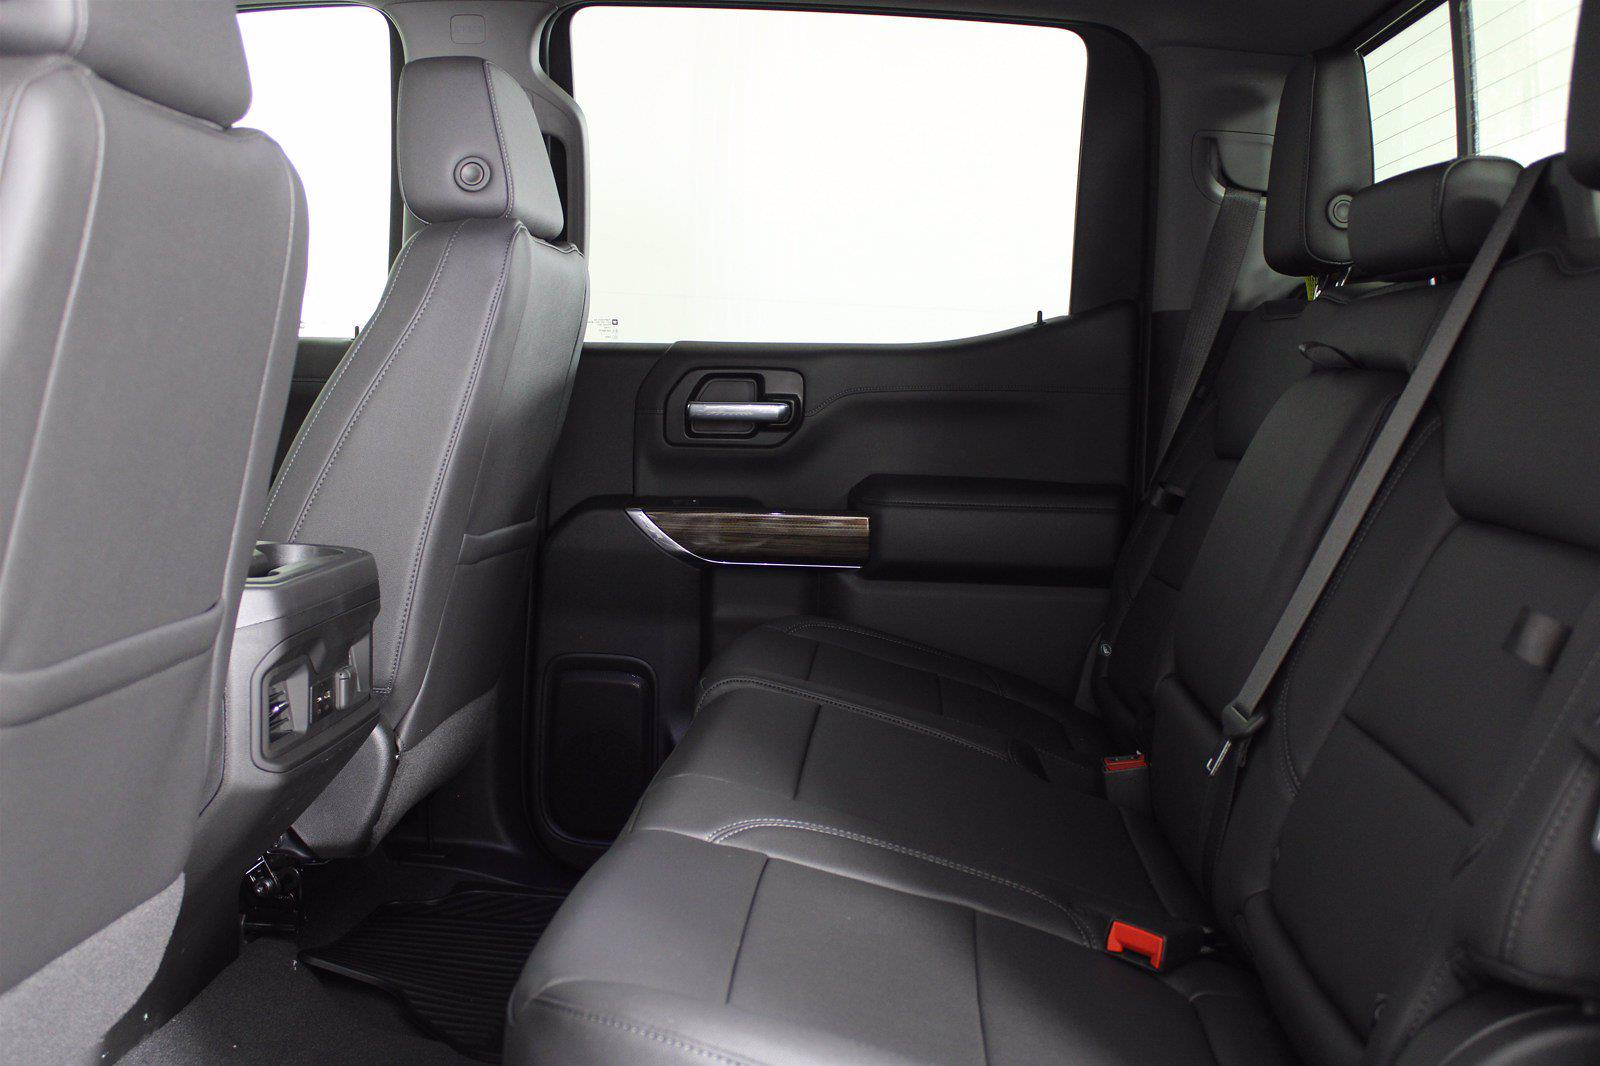 2021 Chevrolet Silverado 1500 Crew Cab 4x4, Pickup #D111073 - photo 17